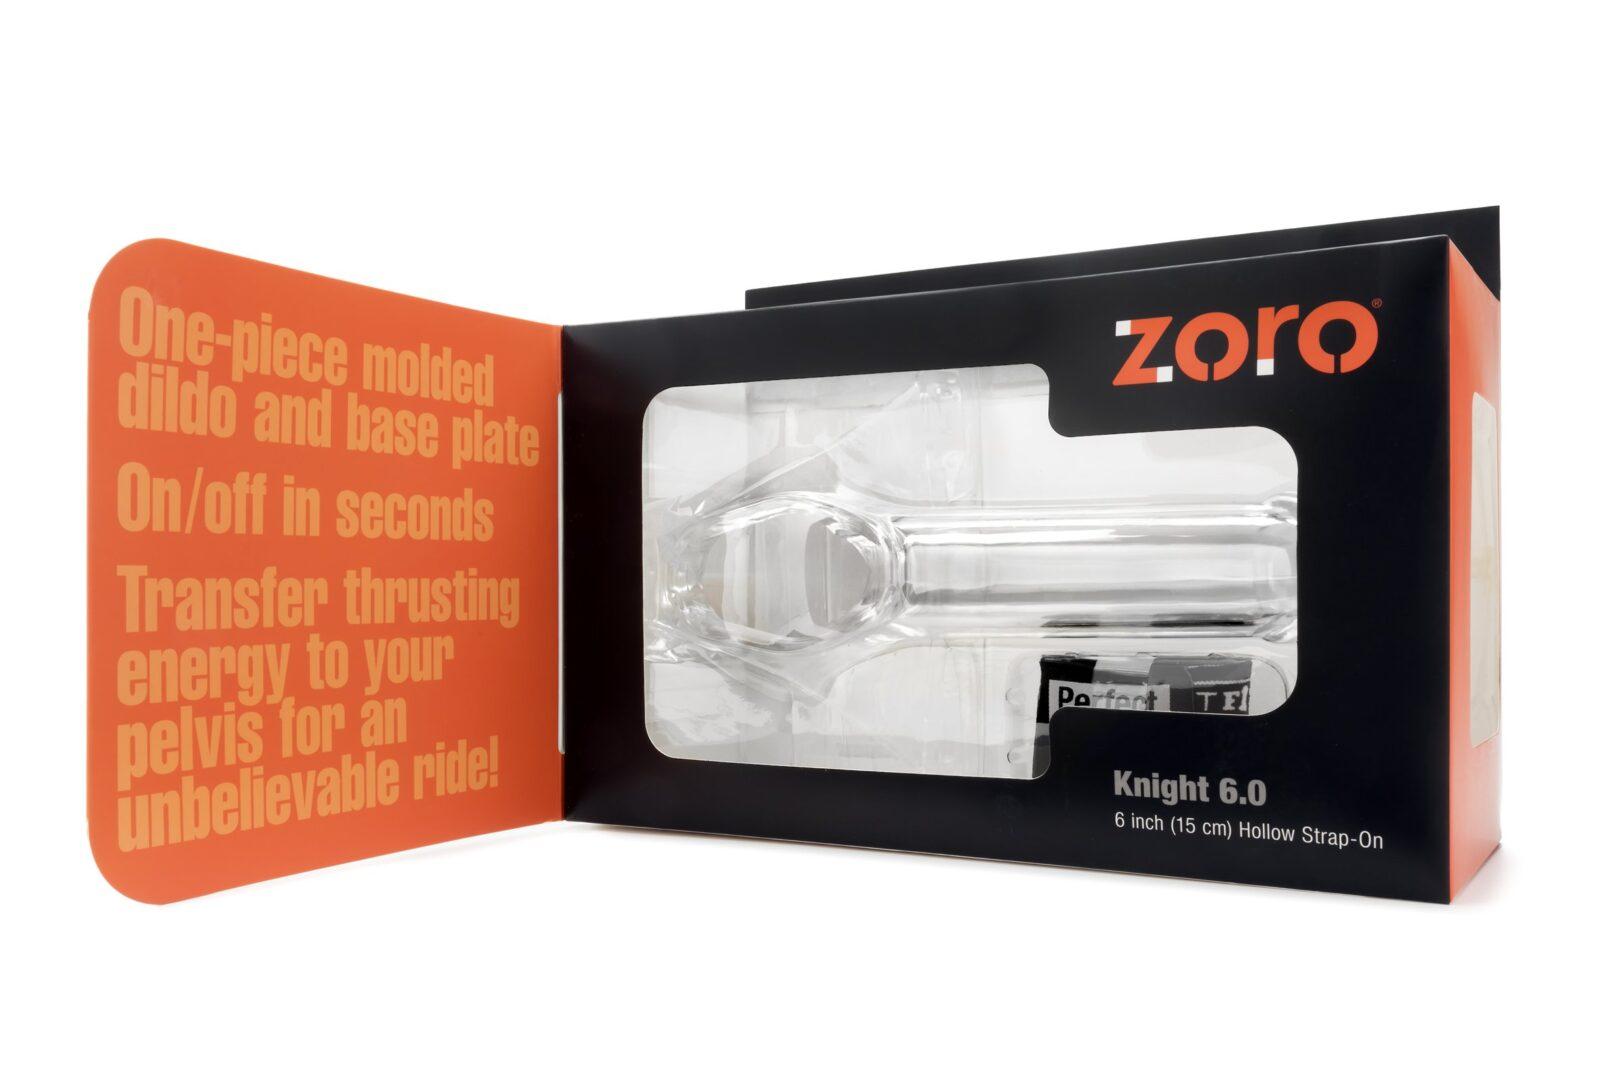 ZR-10C_Zoro_Knight_Pkg1_Hi